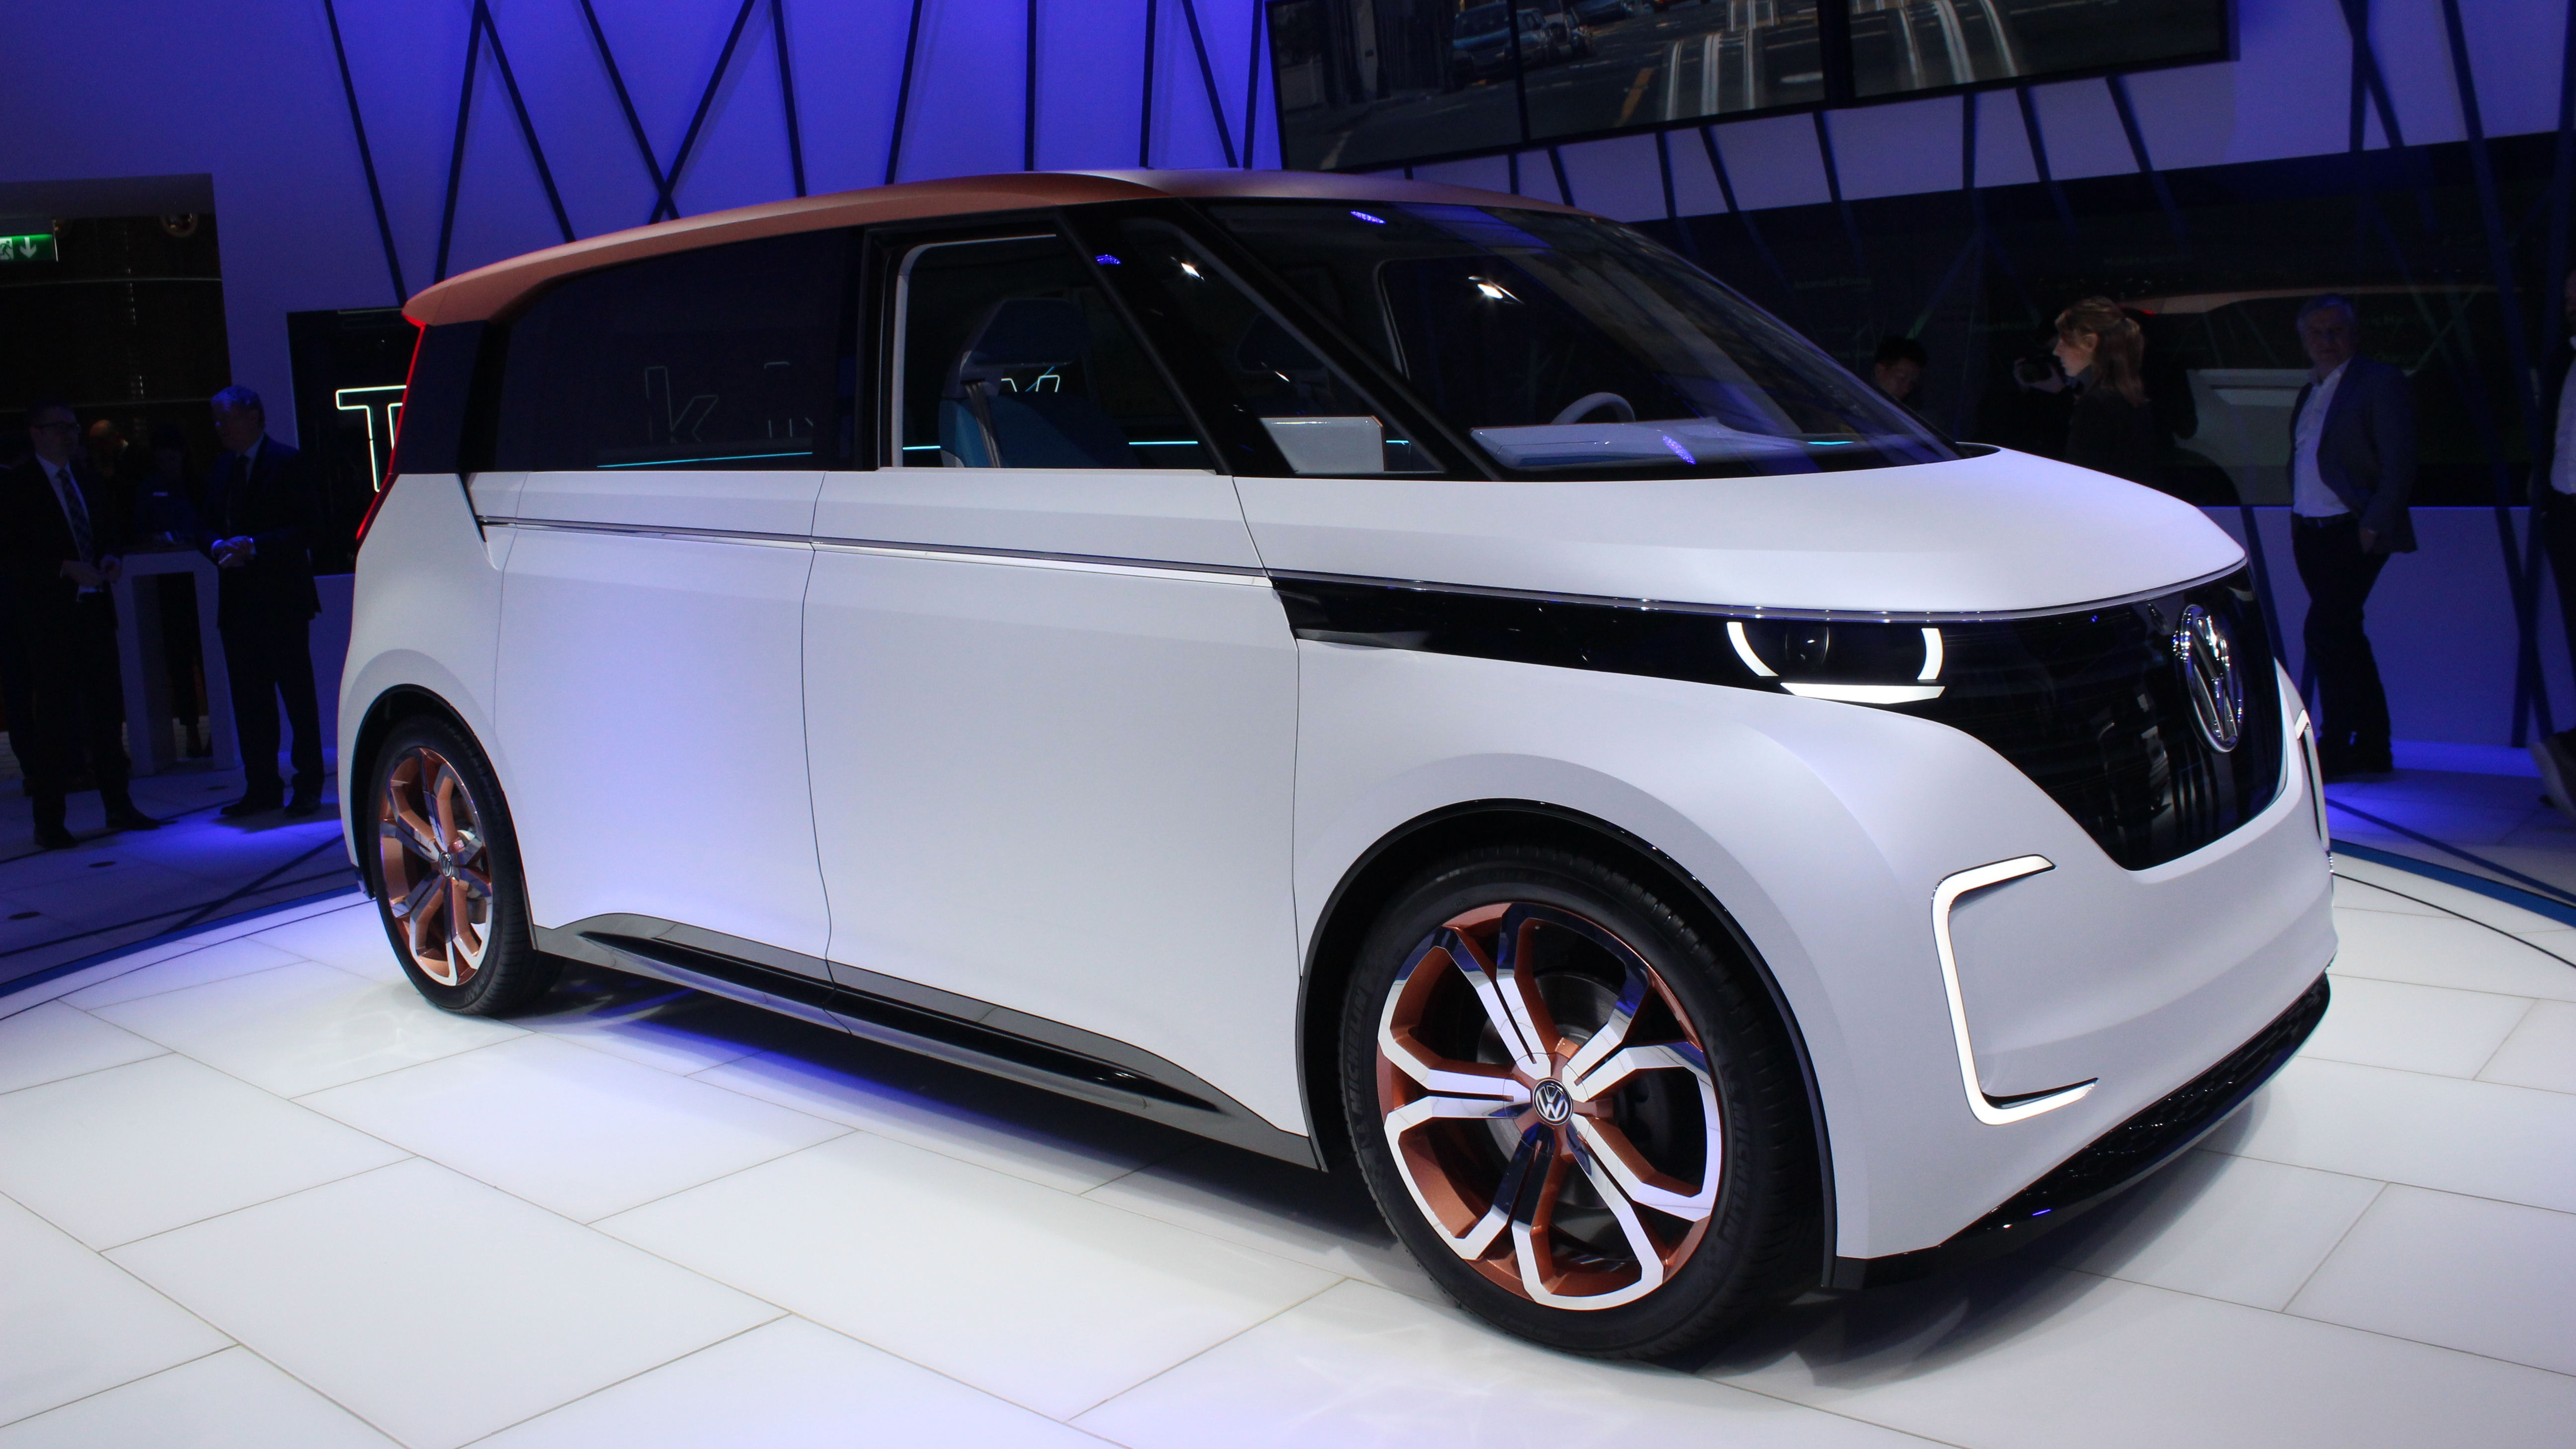 de concept carsvolkswagenlas volkswagen las budd e pin drivessential naar brengt internet vegas auto vegaslast